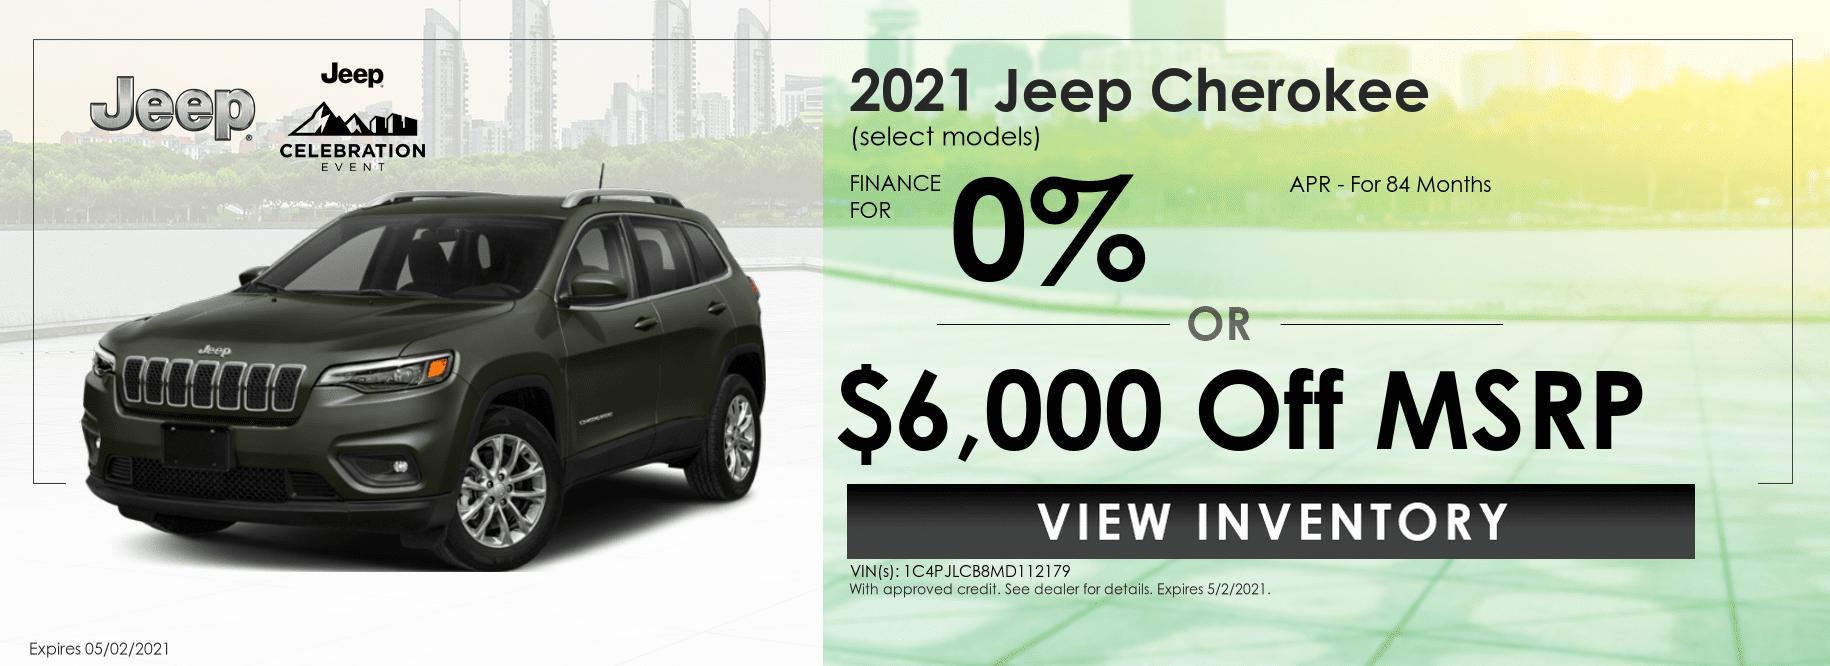 2021-Jeep-Cherokee-(select-models)-7